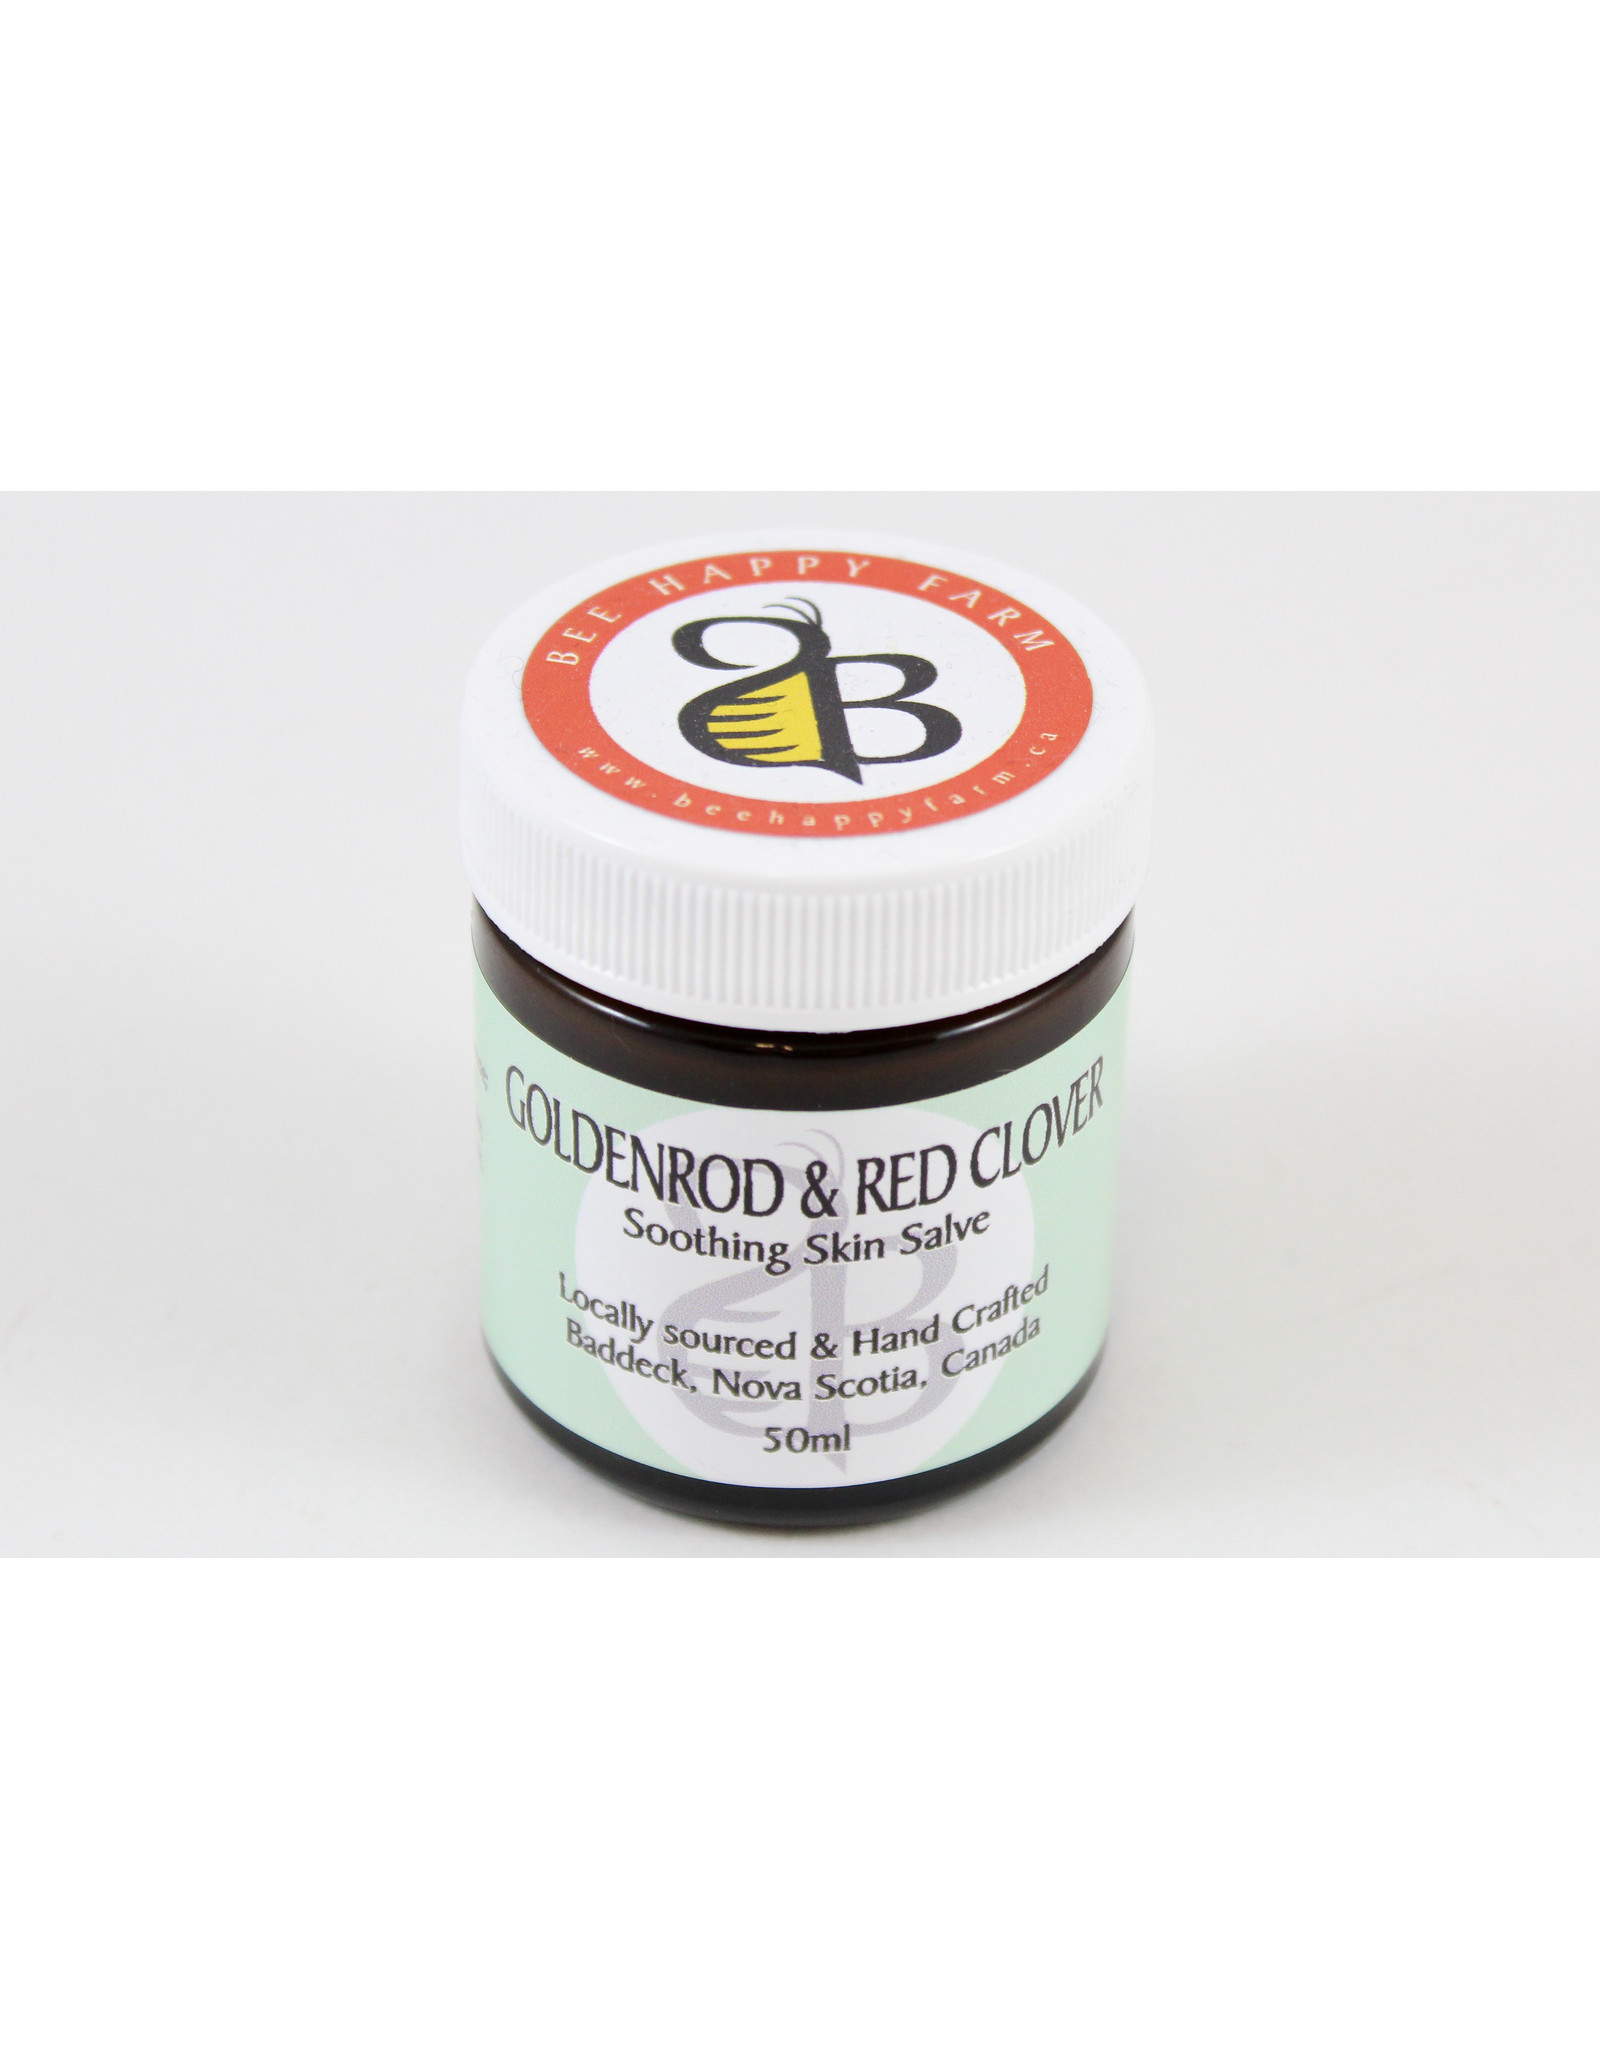 Iris Kedmi Goldenrod & Red Clover Psoriasis+Eczema Salve by Bee Happy Farm